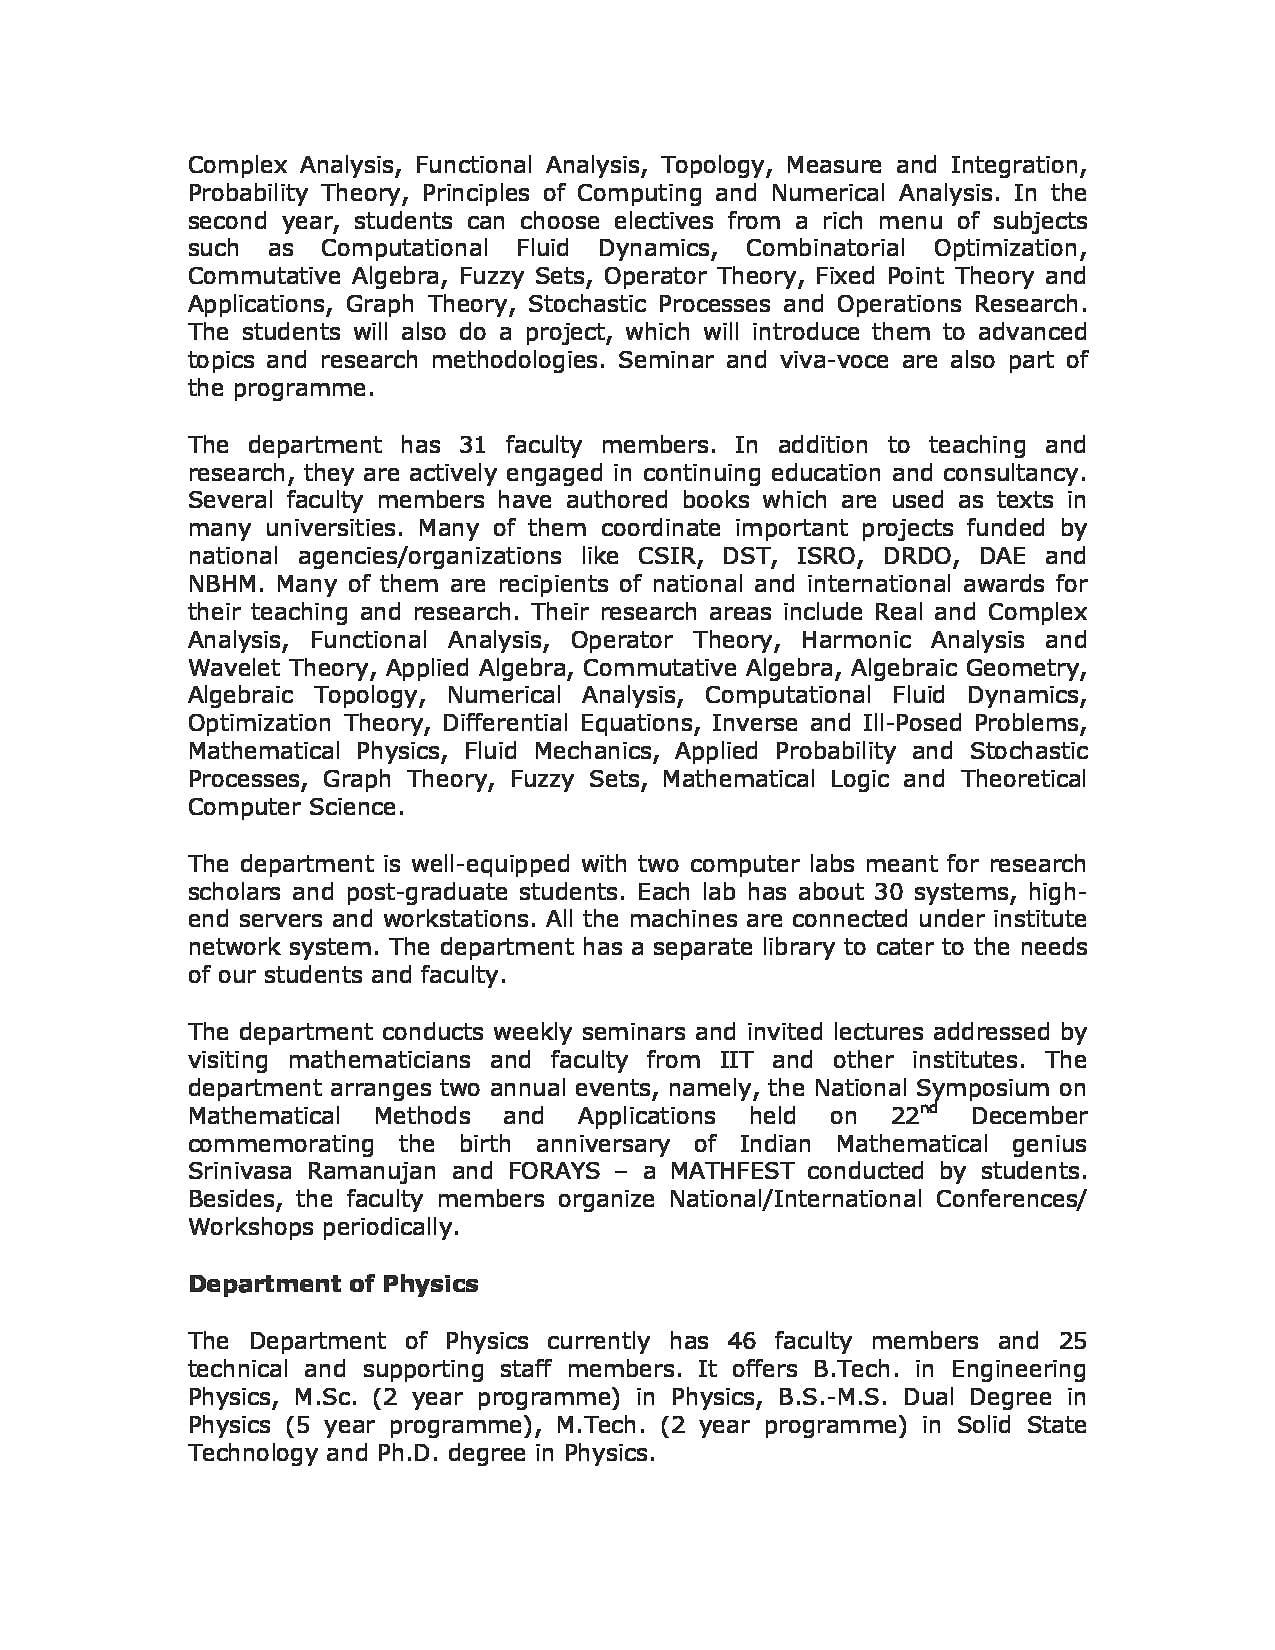 Indian institute of technology madras iitm chennai iitm profile aiddatafo Gallery